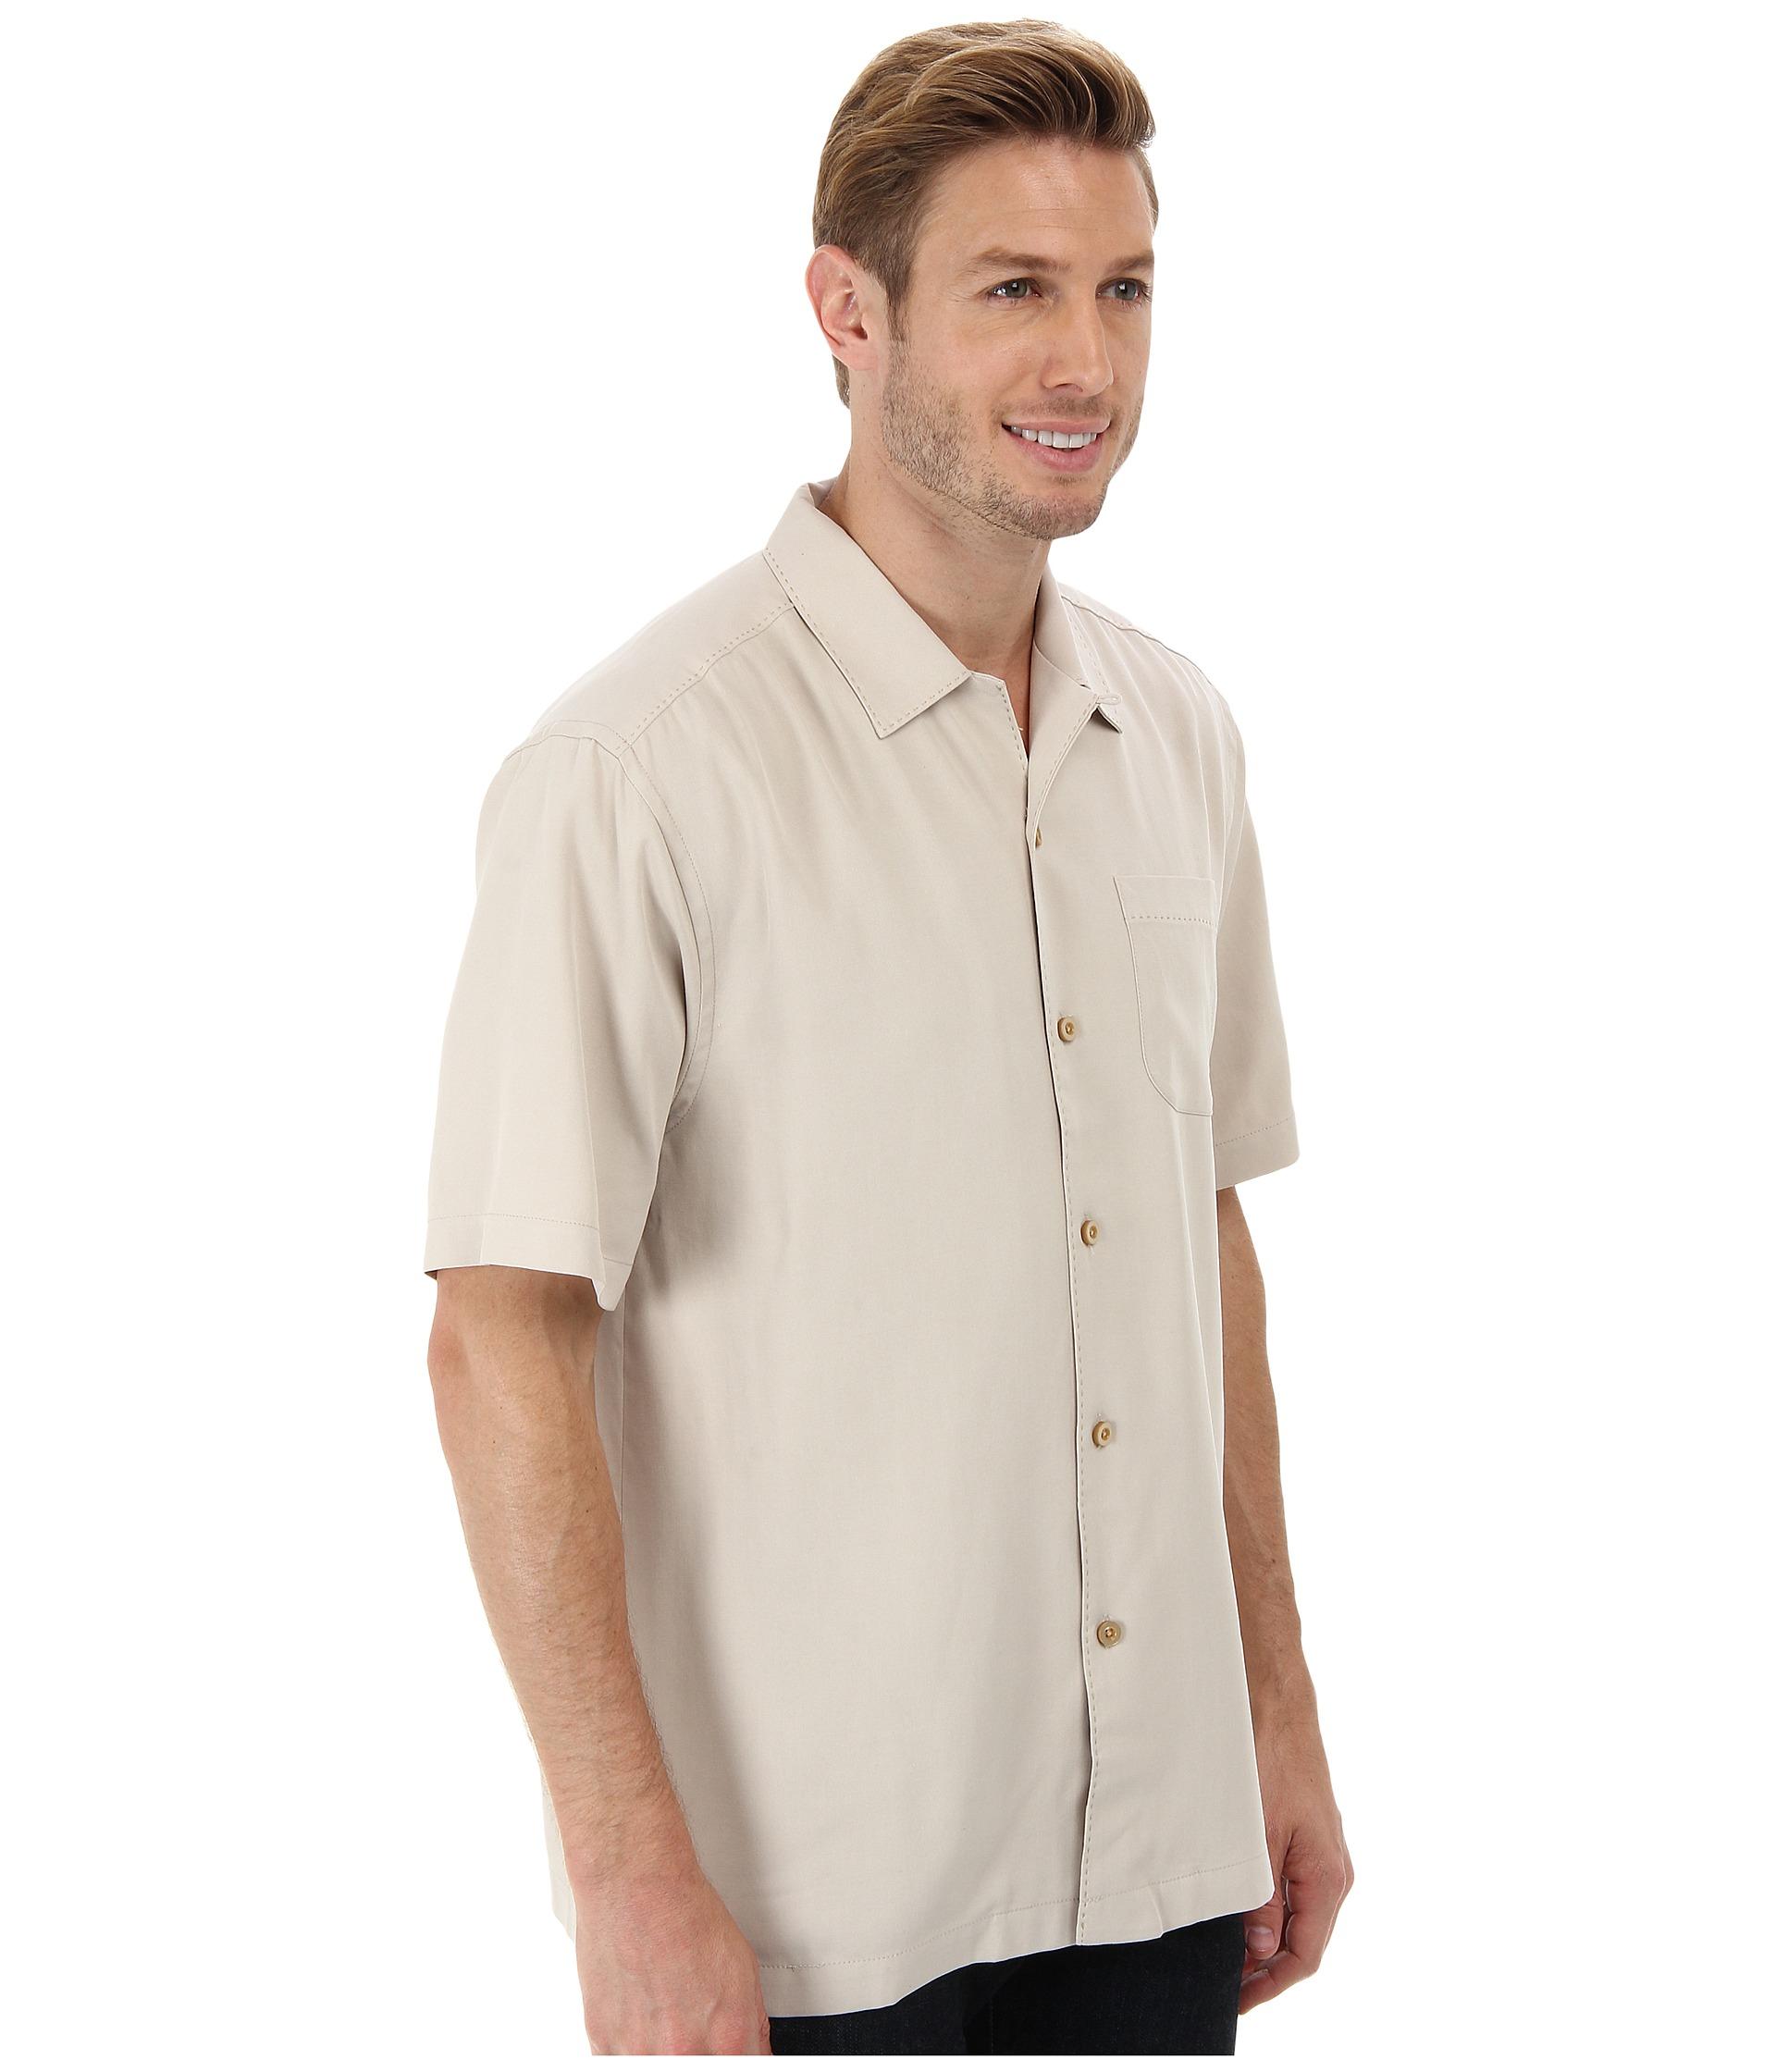 Tommy bahama catalina twill camp shirt in natural for men for Tommy bahama catalina twill silk camp shirt